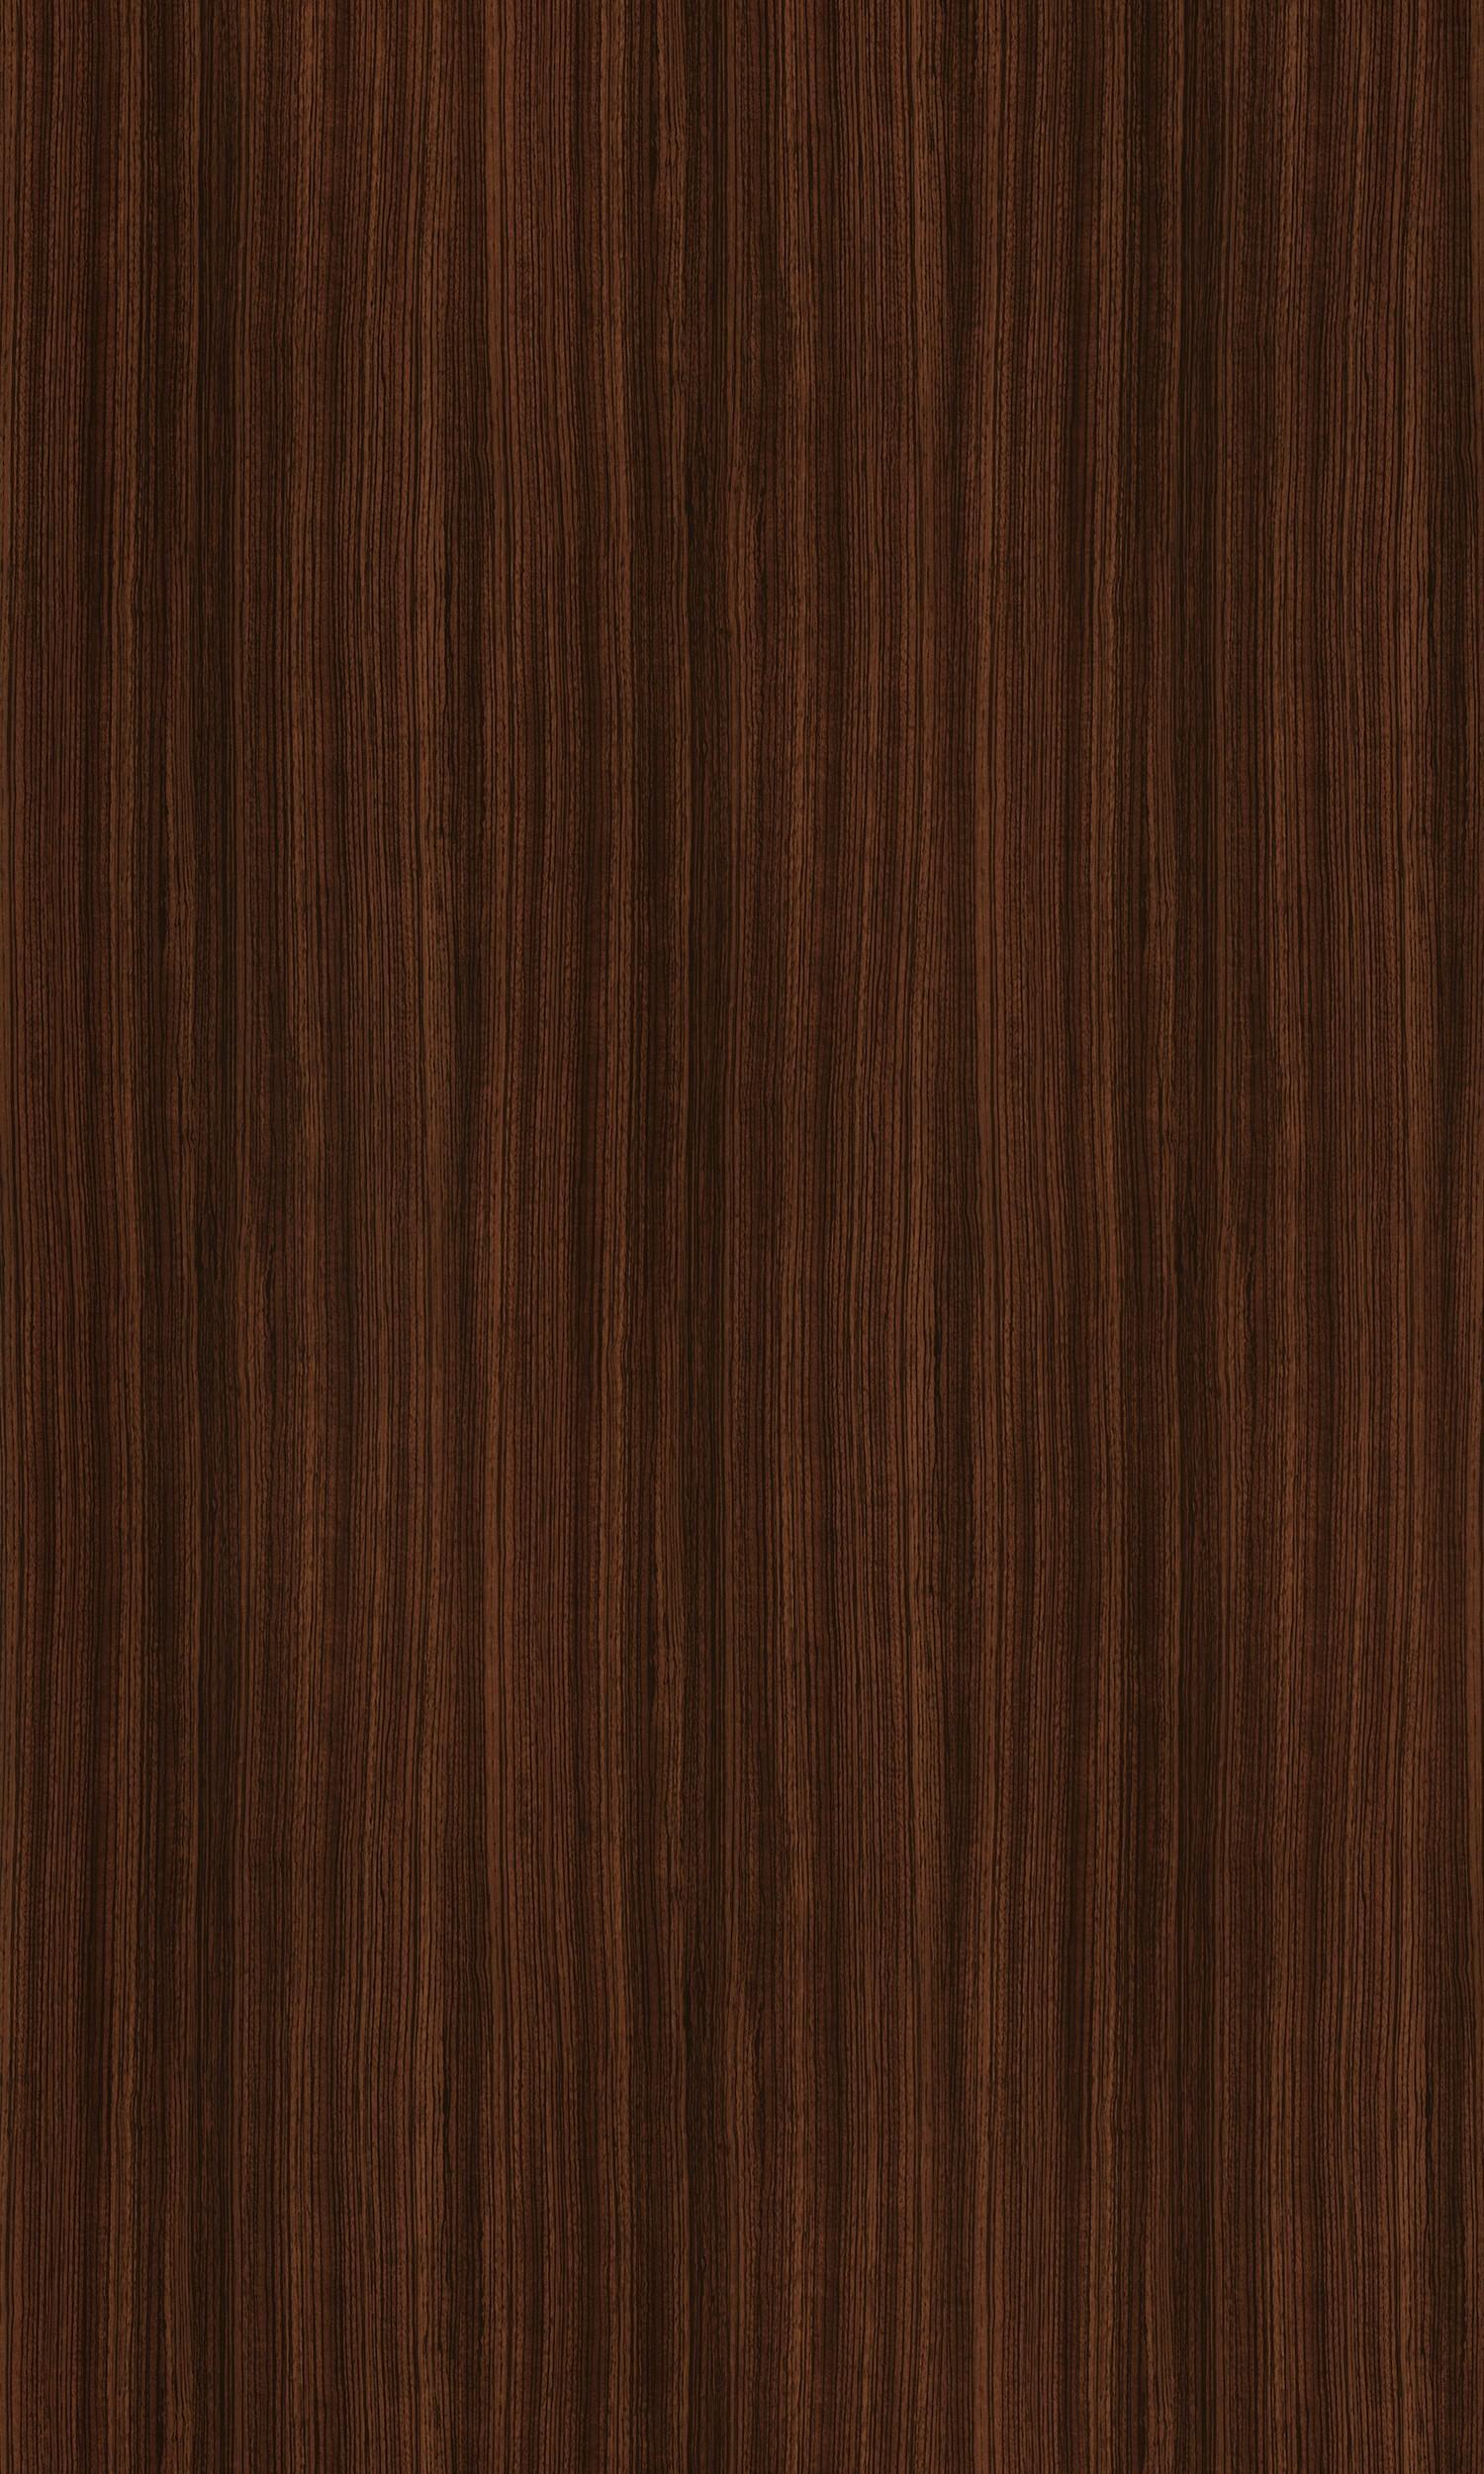 Zebrawood 7958 Premium Wood Prints Laminate